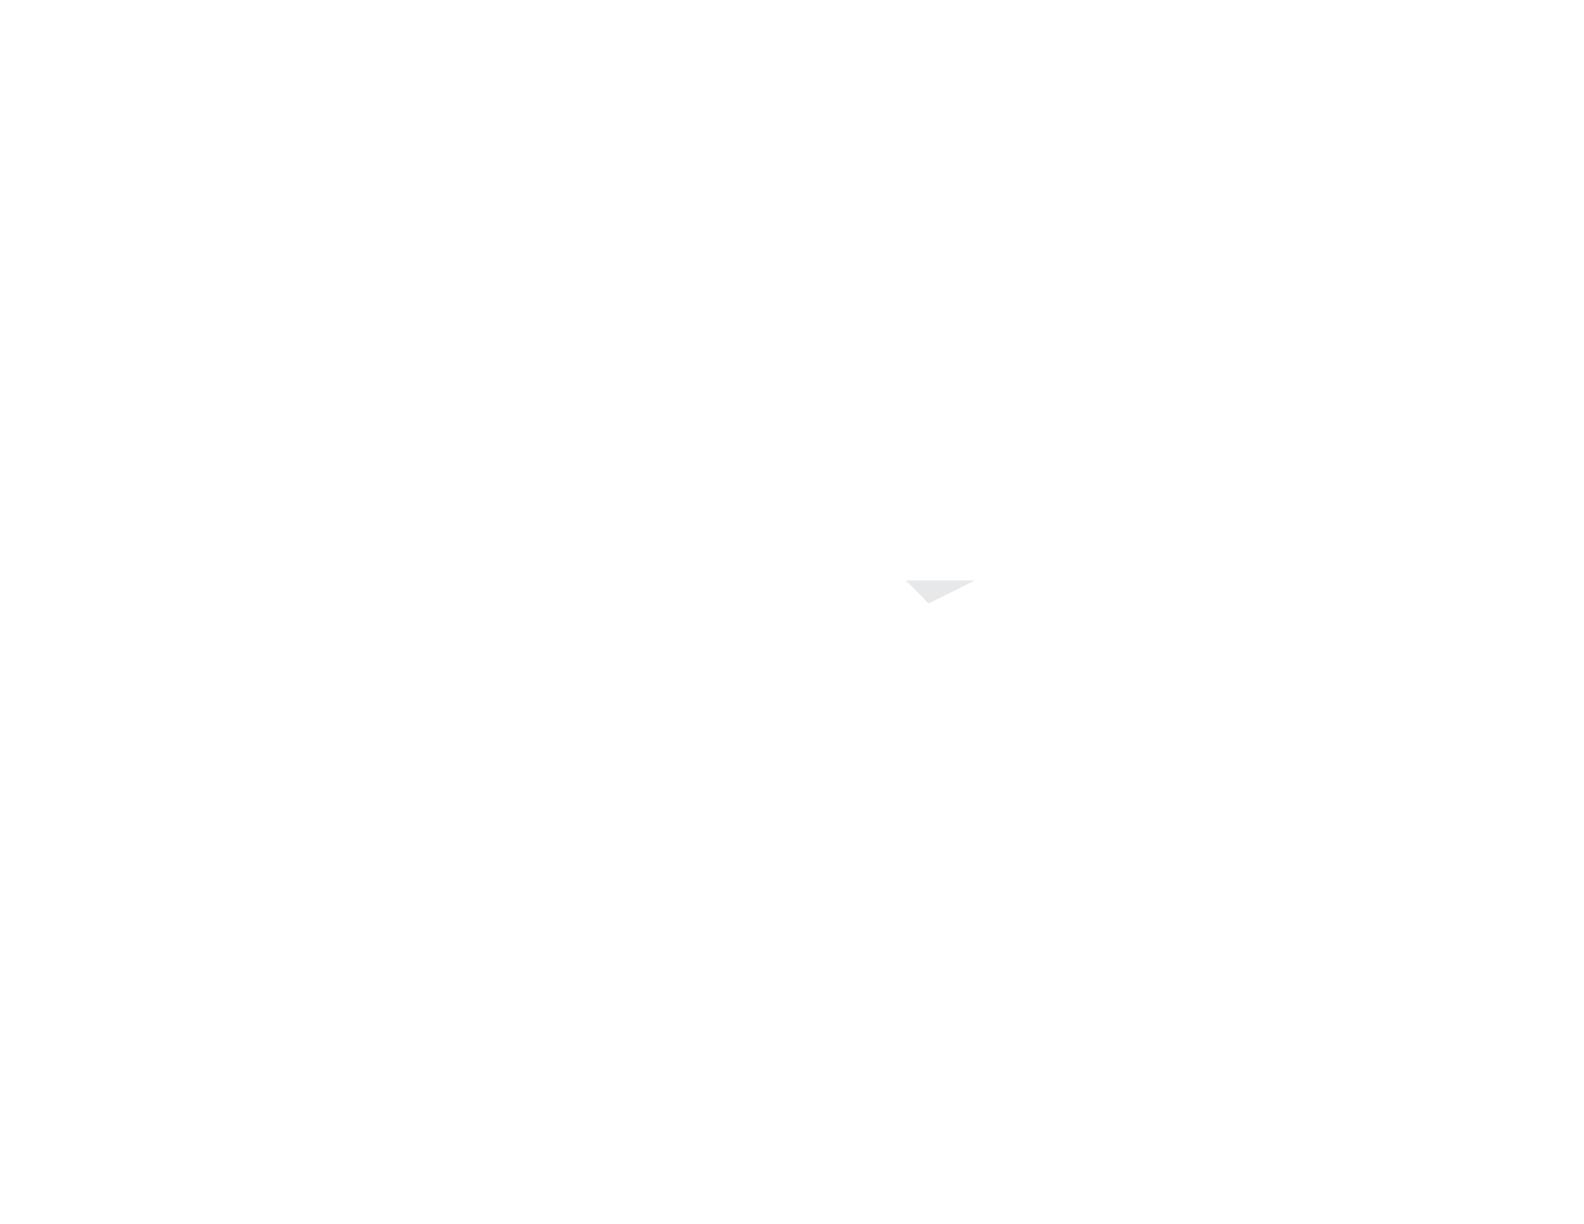 Envano, Inc